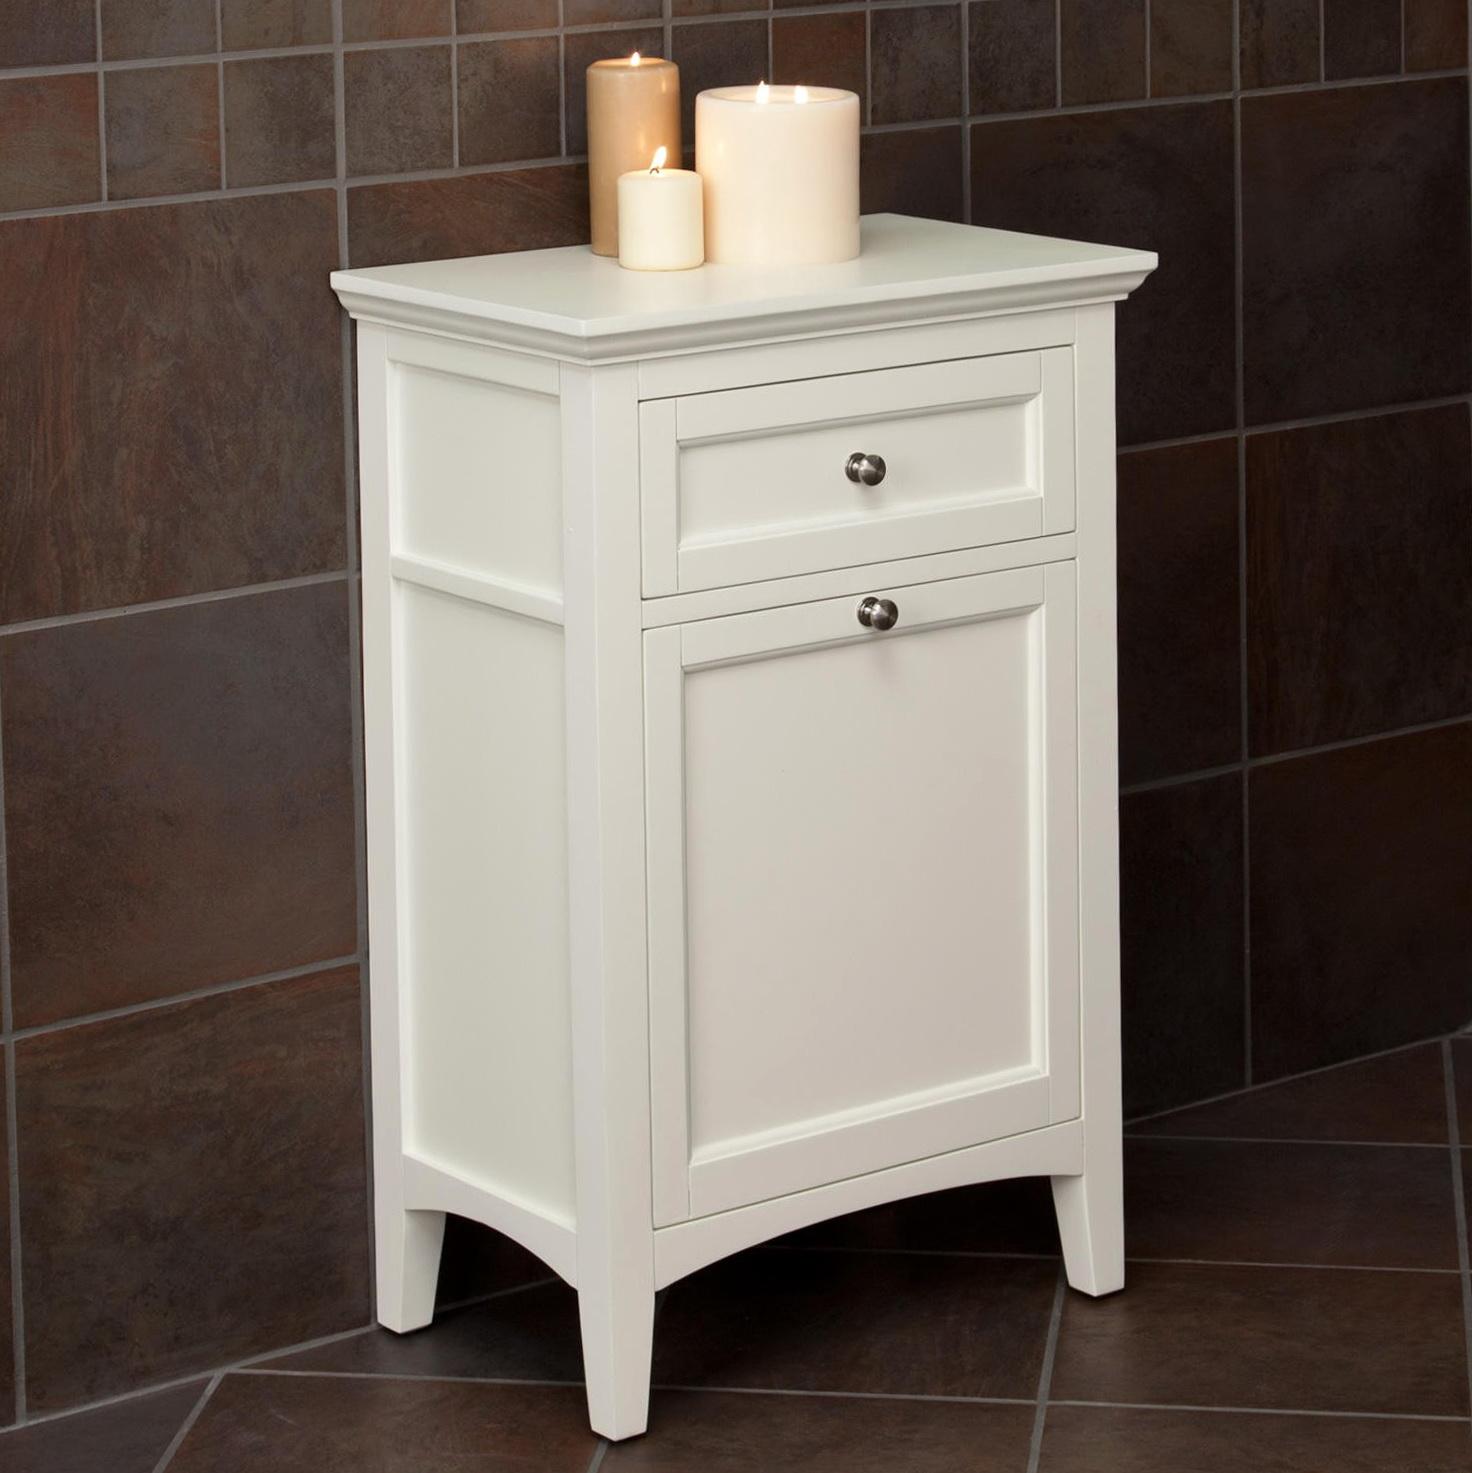 Bathroom Storage Cabinet With Hamper